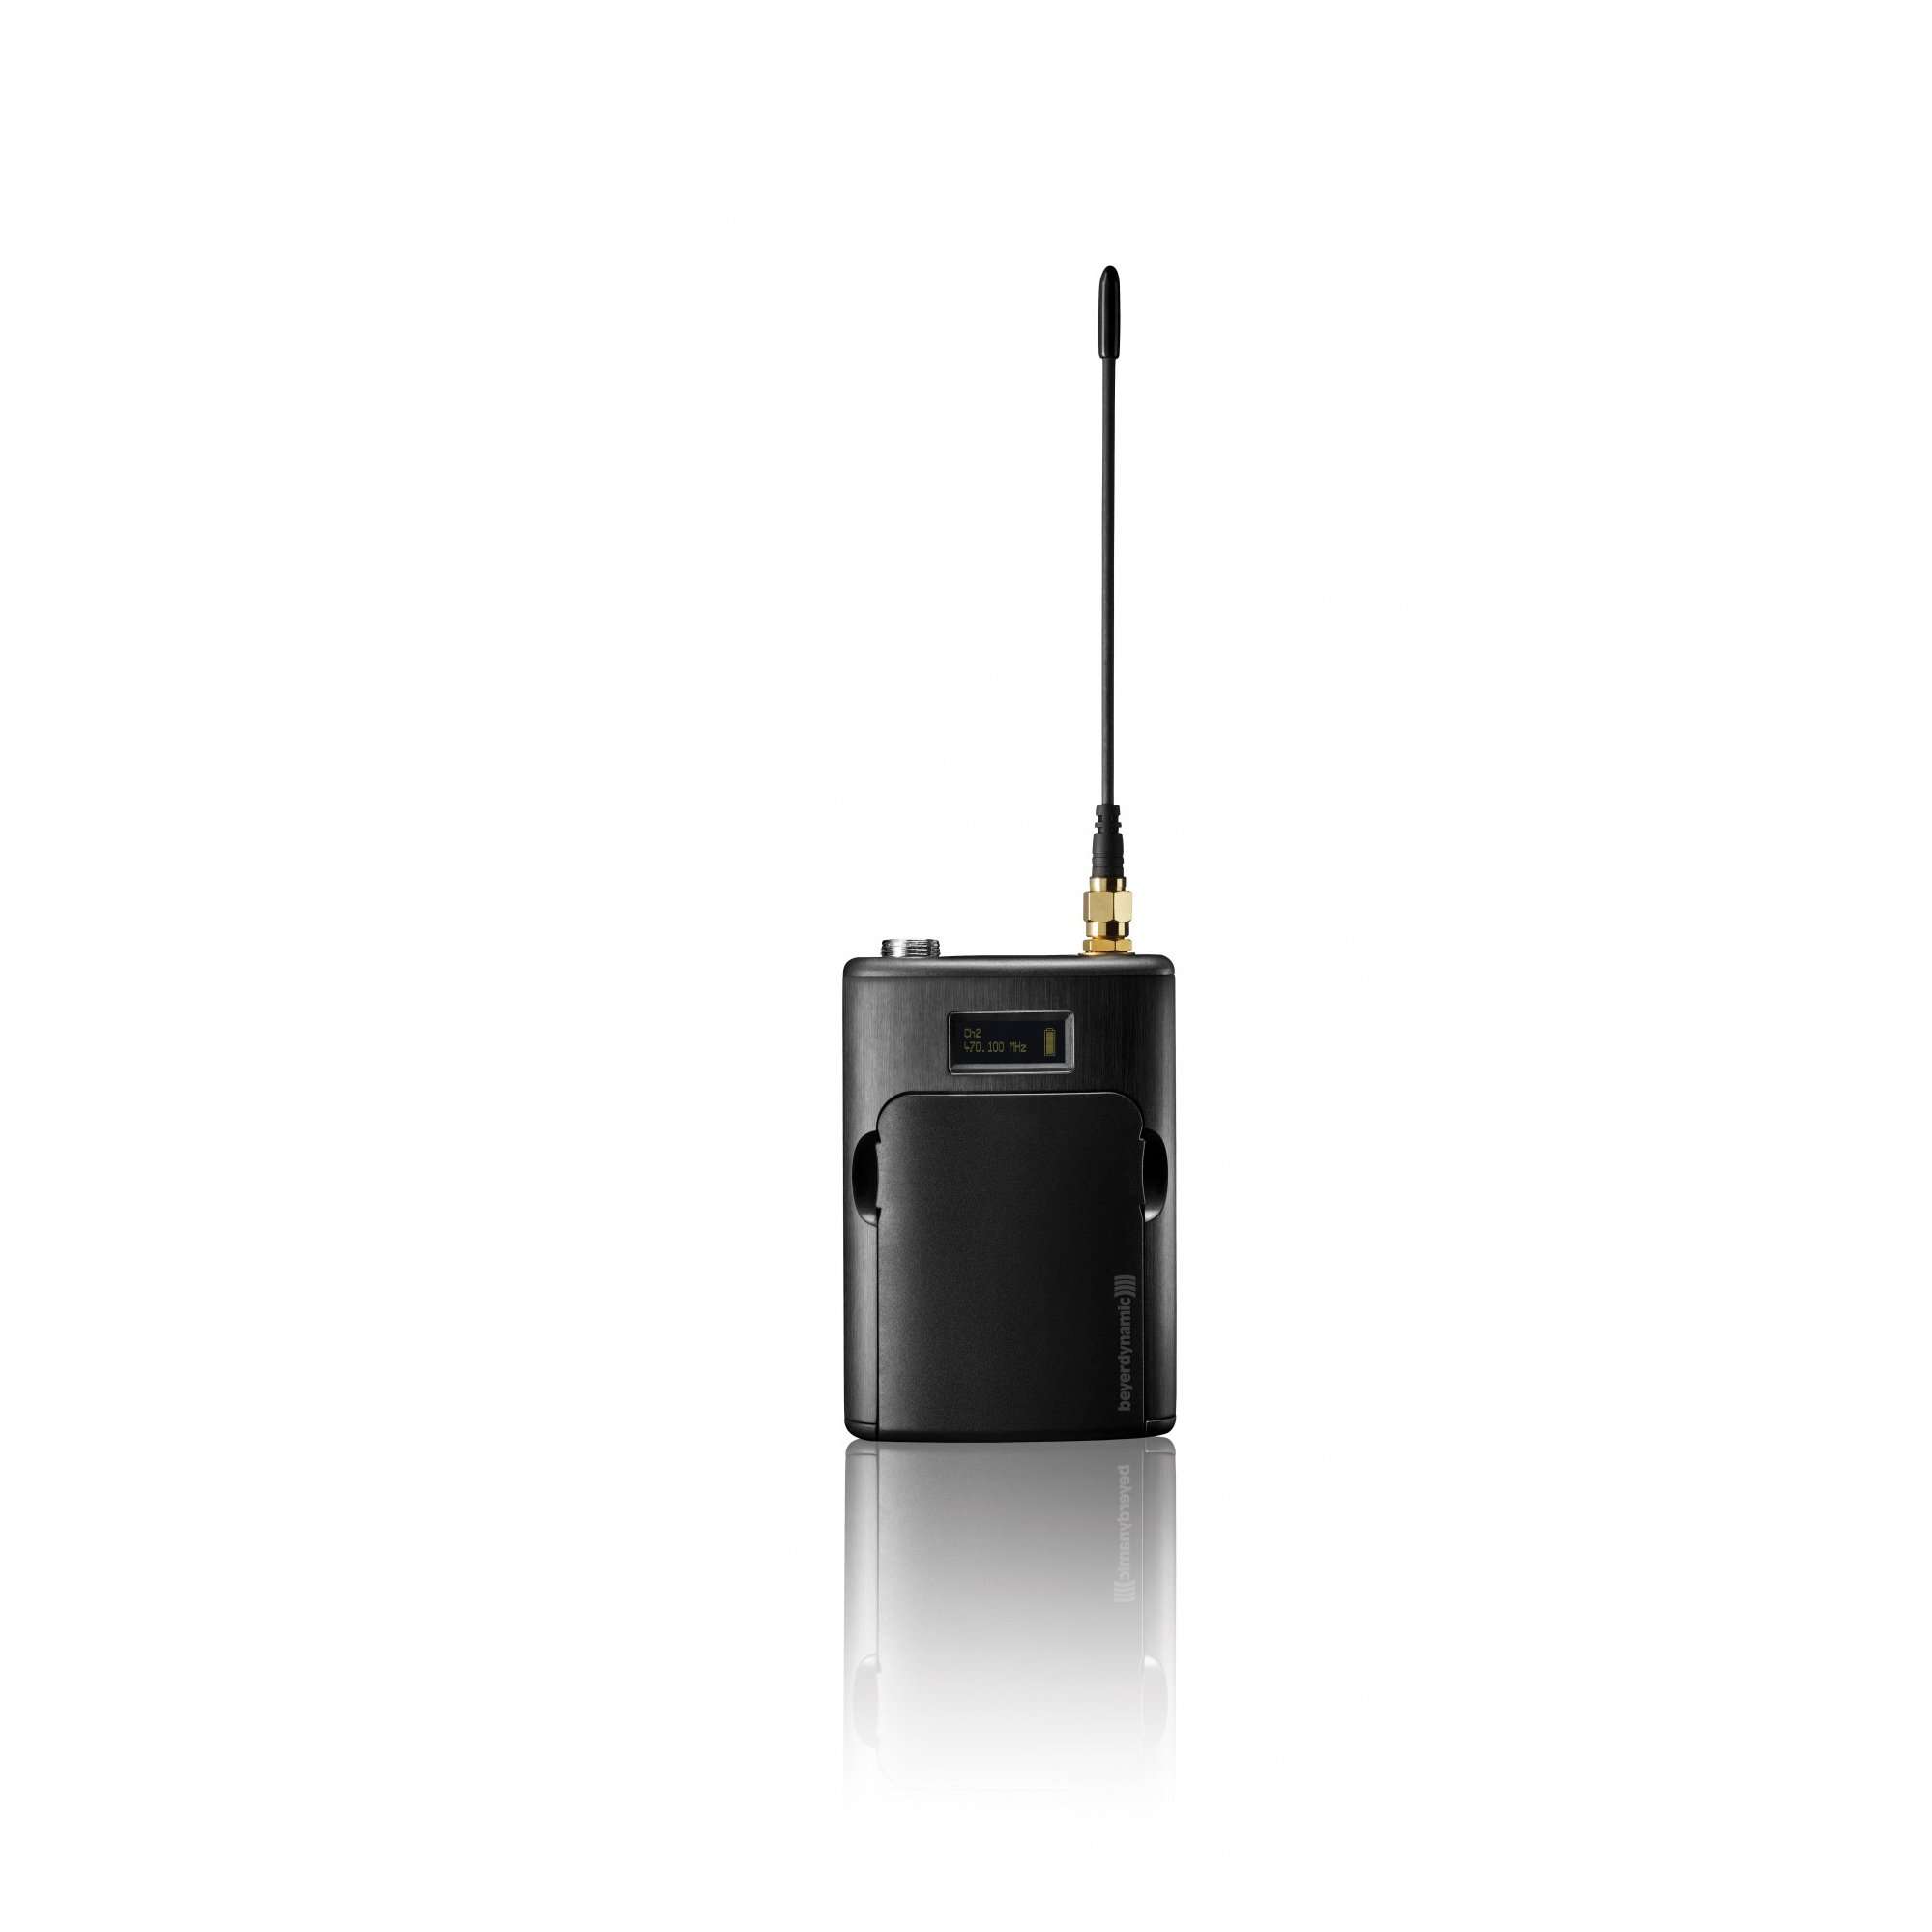 Beltpack Transmitter Only